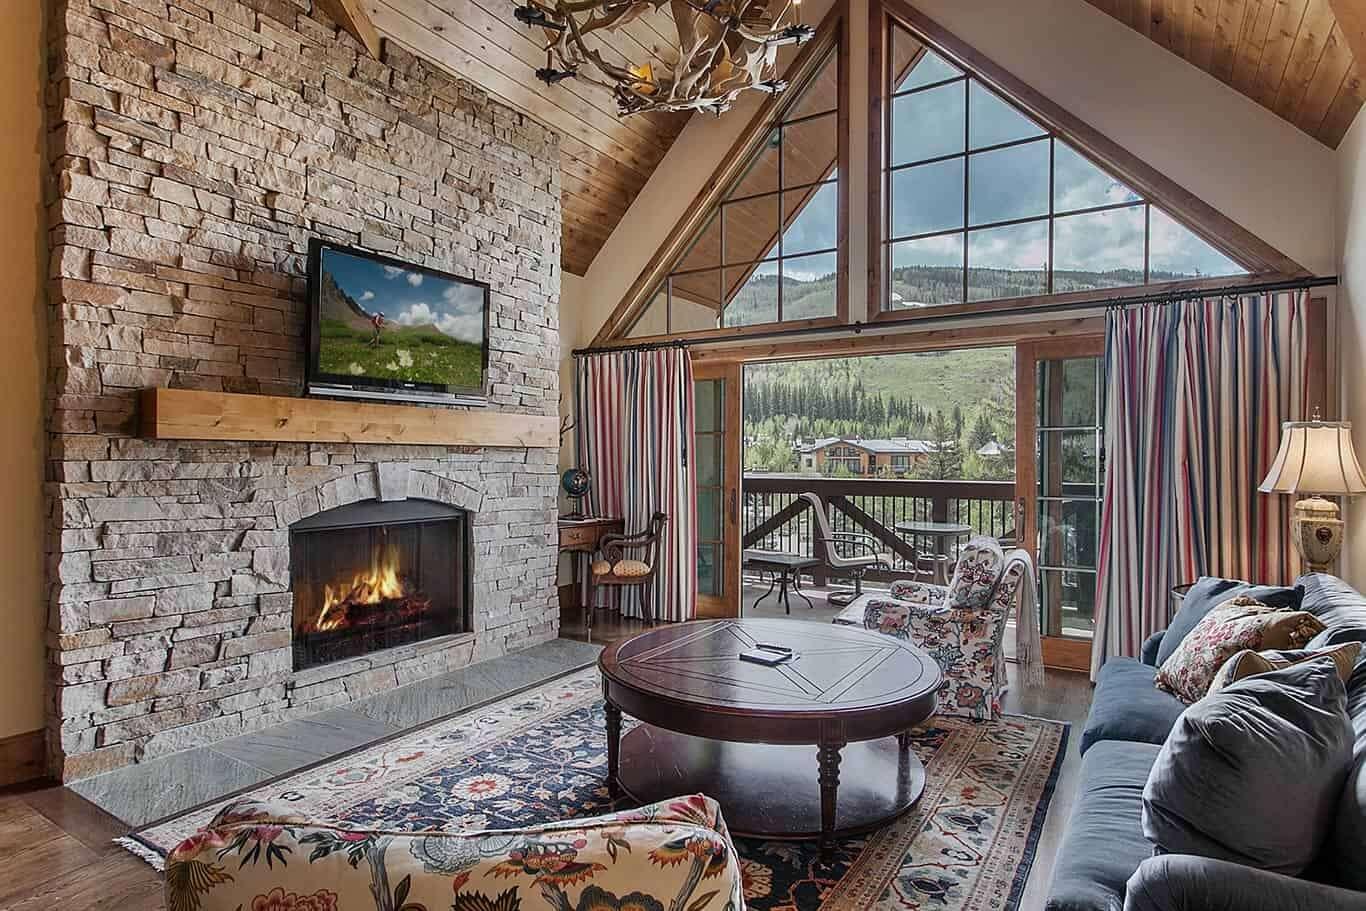 Luxury vacation rentals usa - Colorado - Vail - Mountain View Residence #405 - Image 1/33